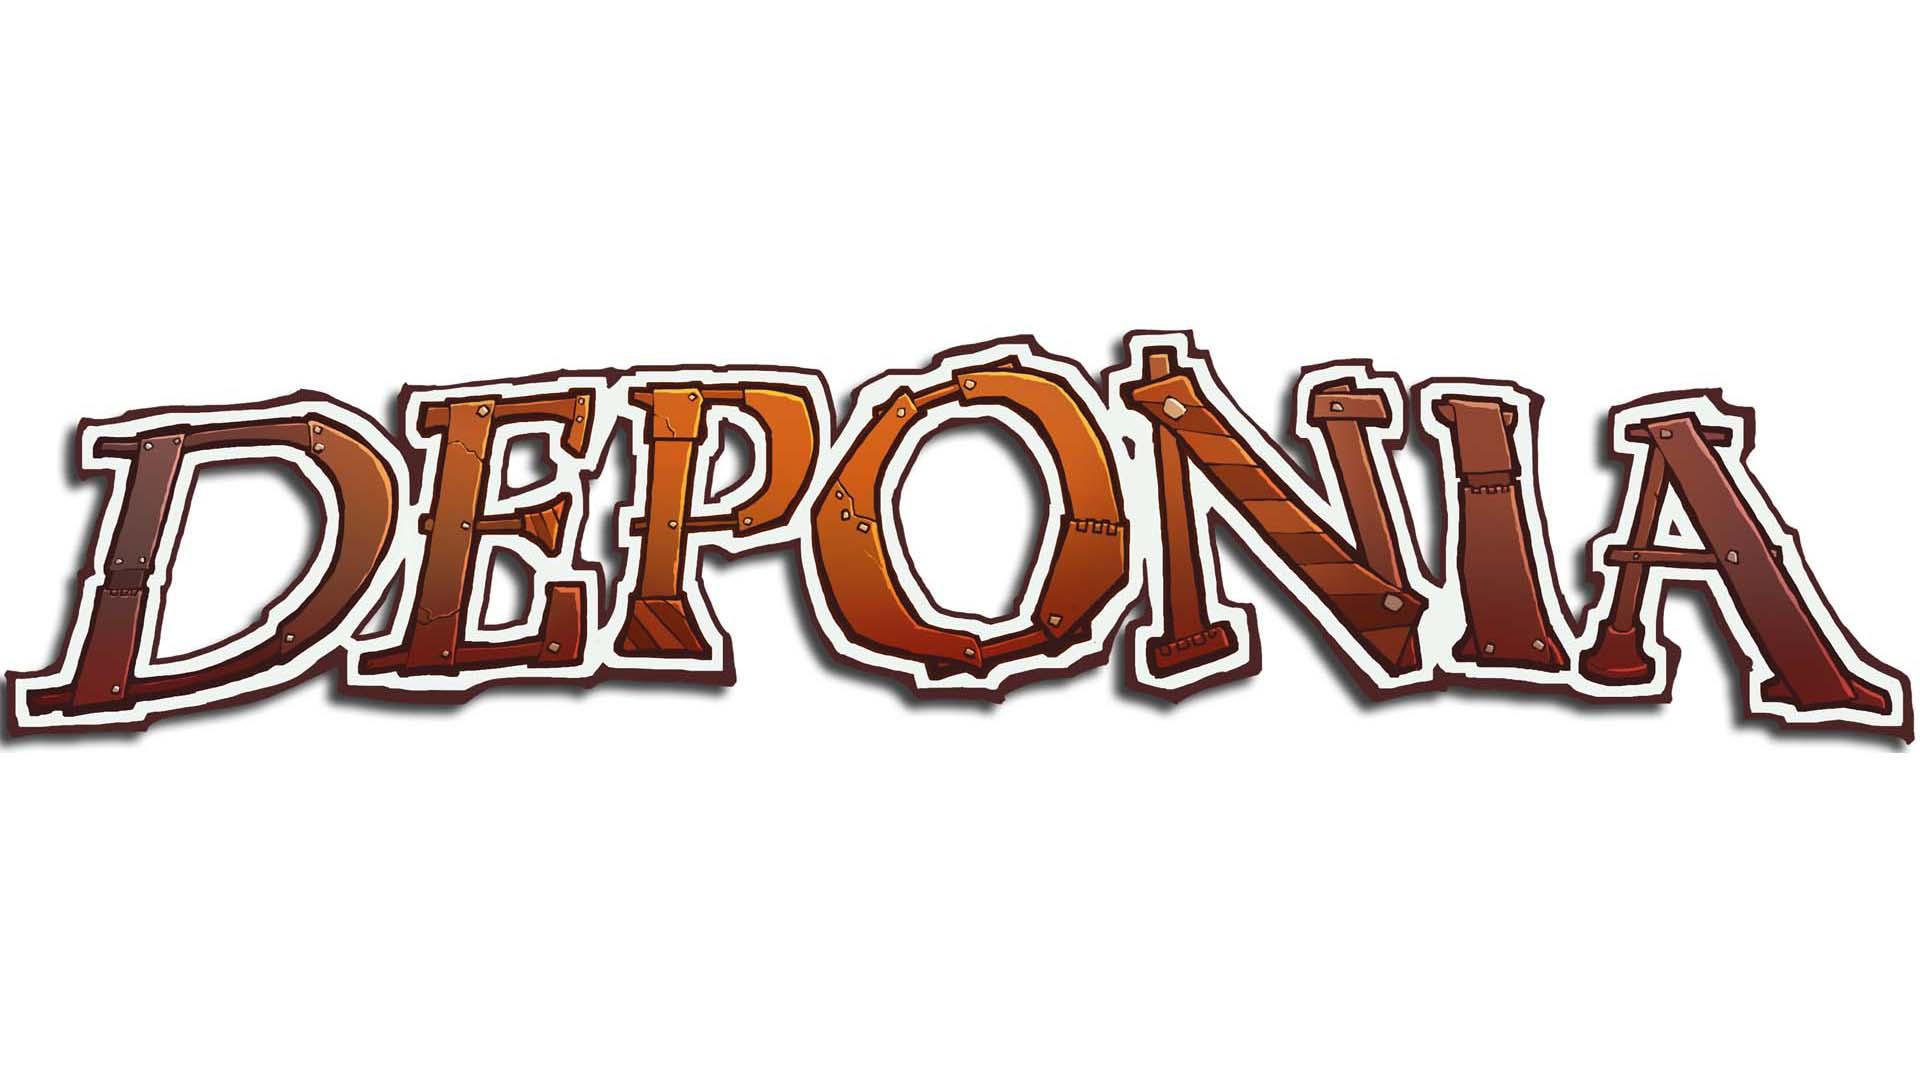 Deponia Offizielles Release Datum News Mgm